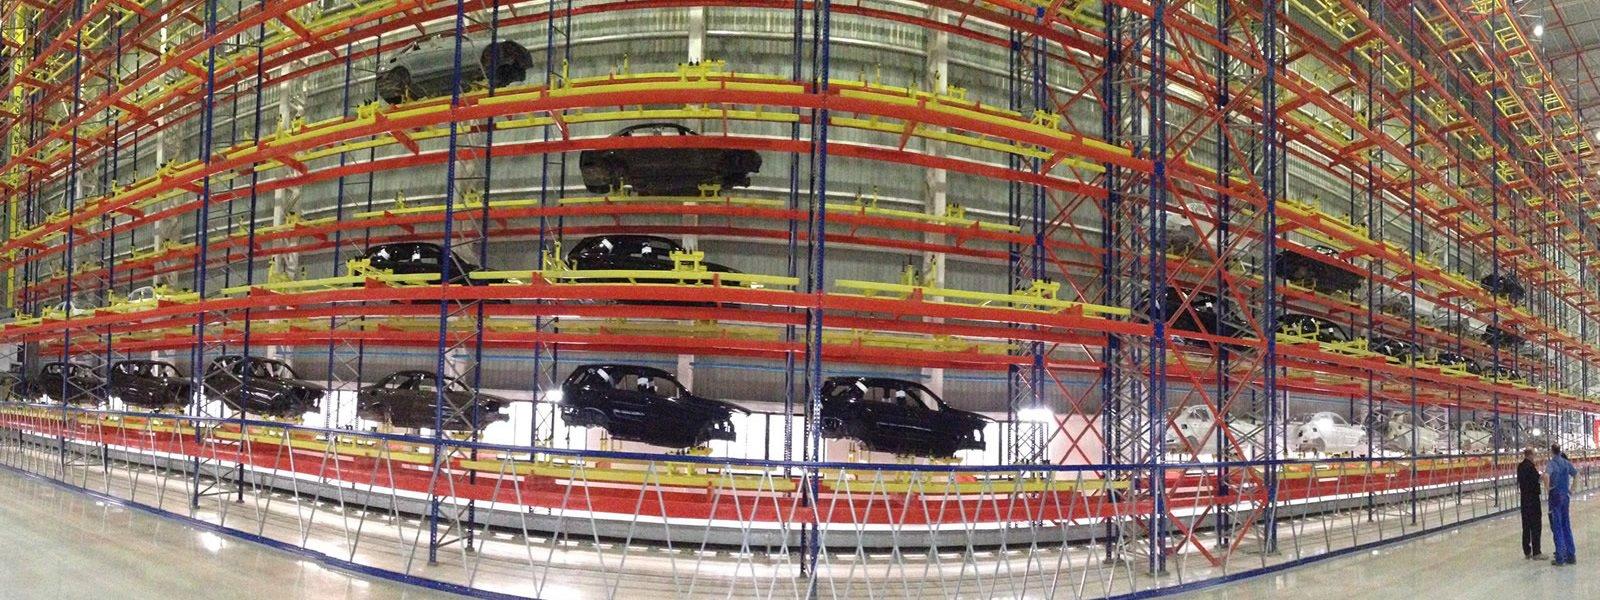 Transstockeur ATS Group, Appalette Tourtellier Systèmes, ATS Conveyors India, HERO Fördertechnik, stockage de carosseries peintes chez Mercedes Benz India